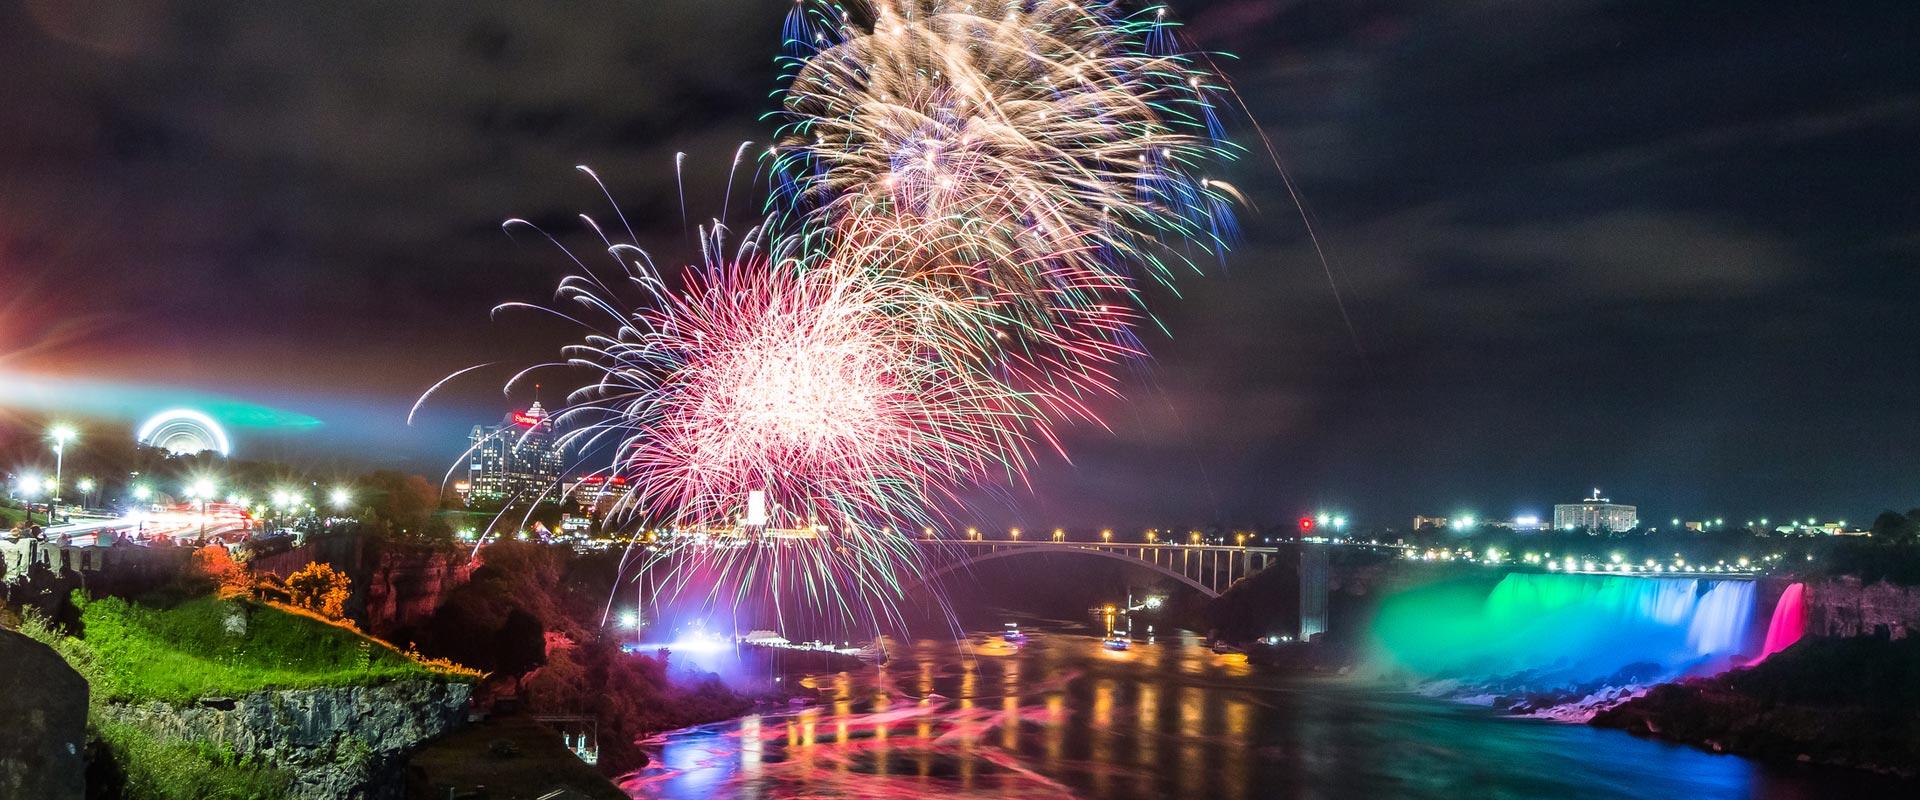 2019 Niagara Falls Summer Fireworks